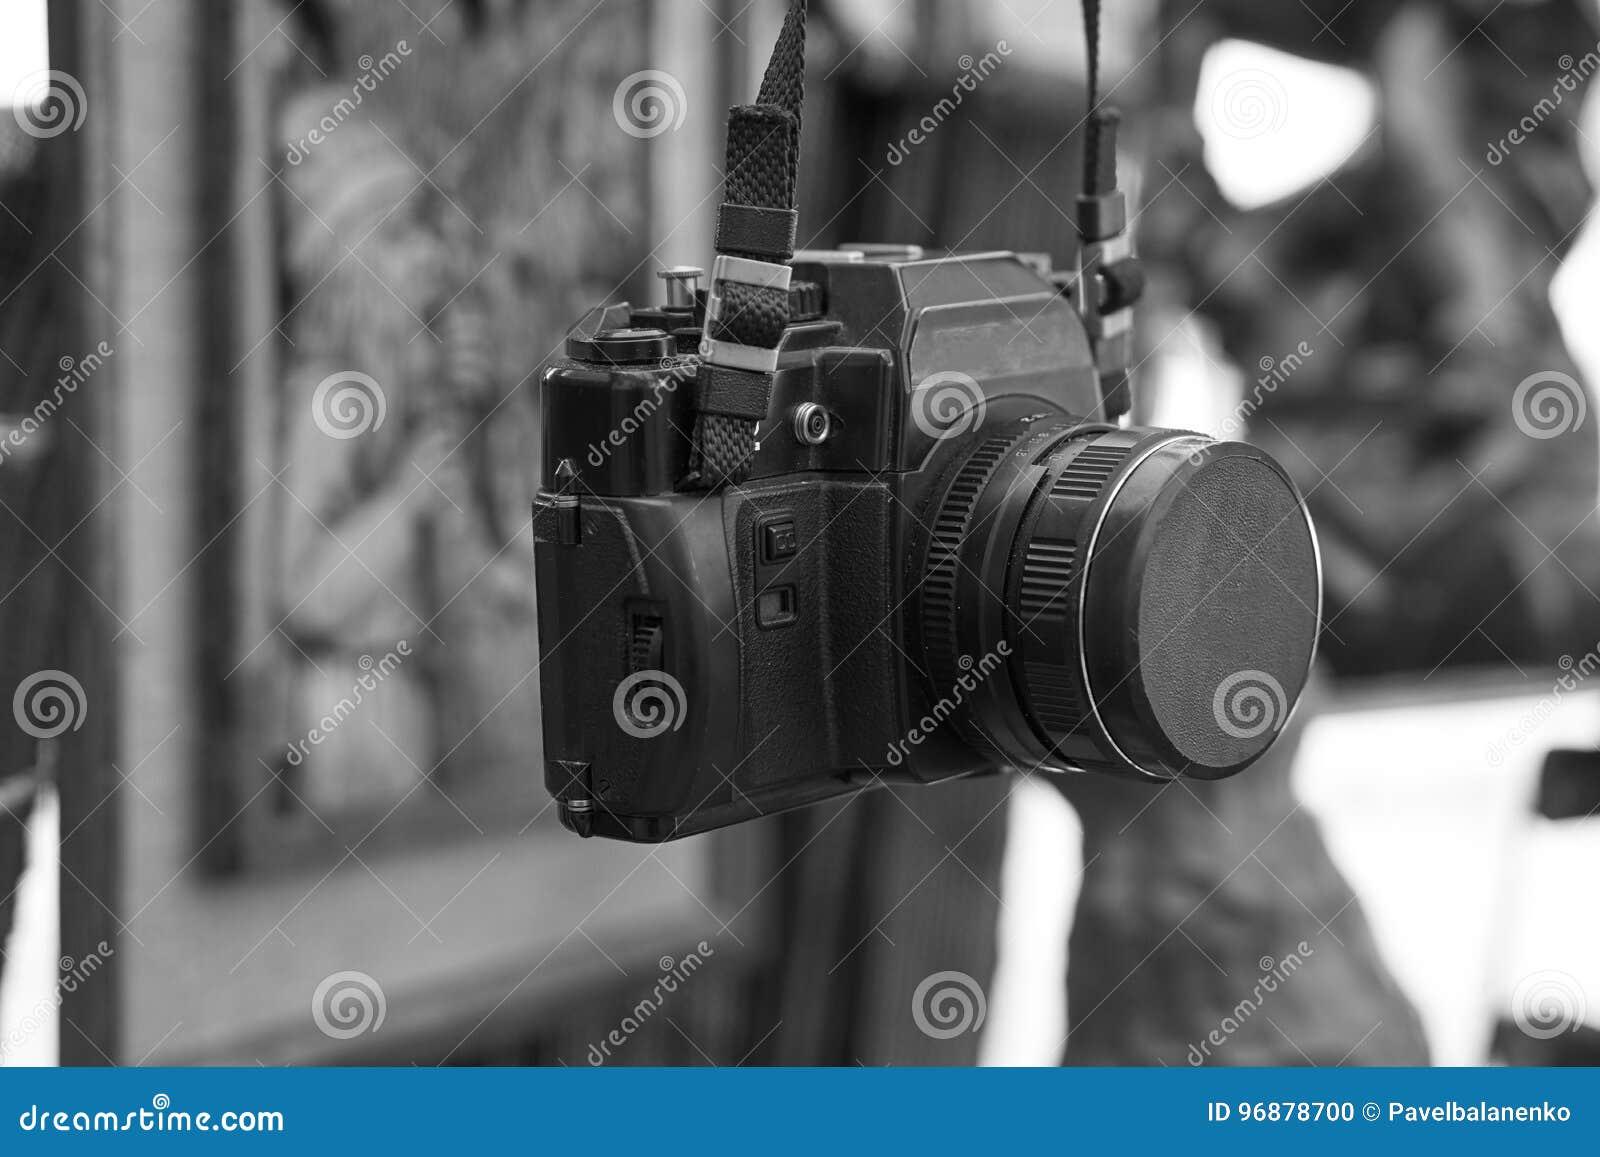 Old retro vintage film camera on a neck strap